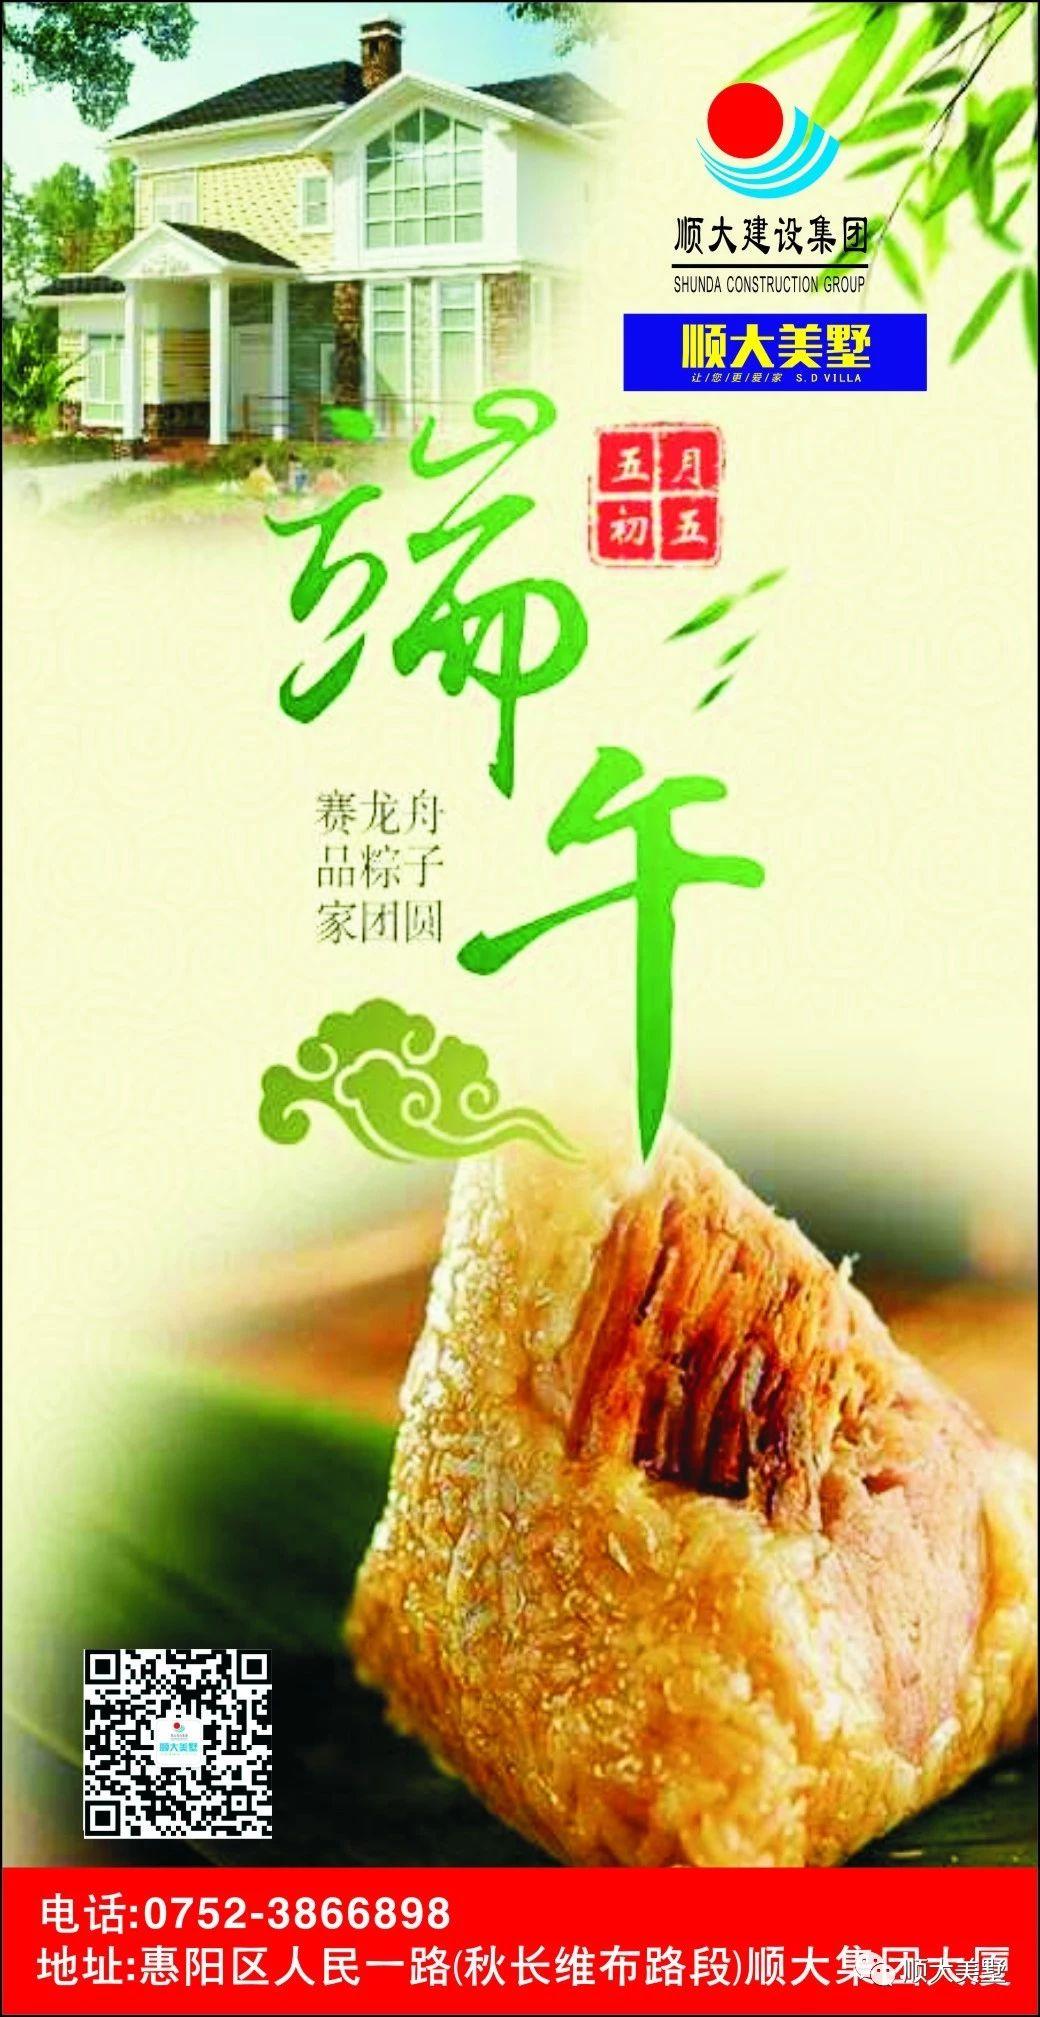 Shun Dameishu, I wish you a happy Dragon Boat Festival